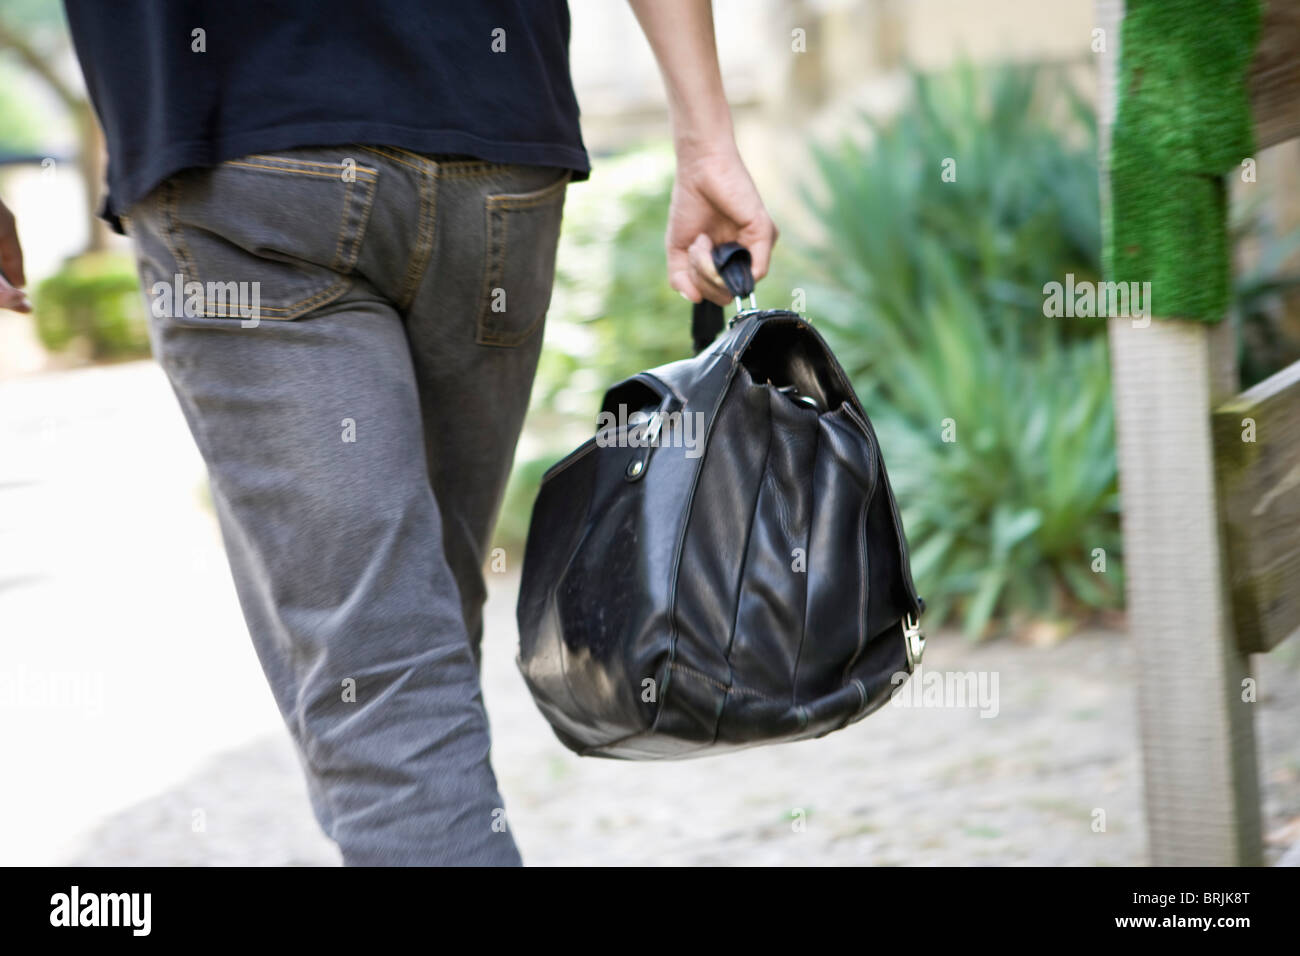 Man carrying bag, rear view Stock Photo